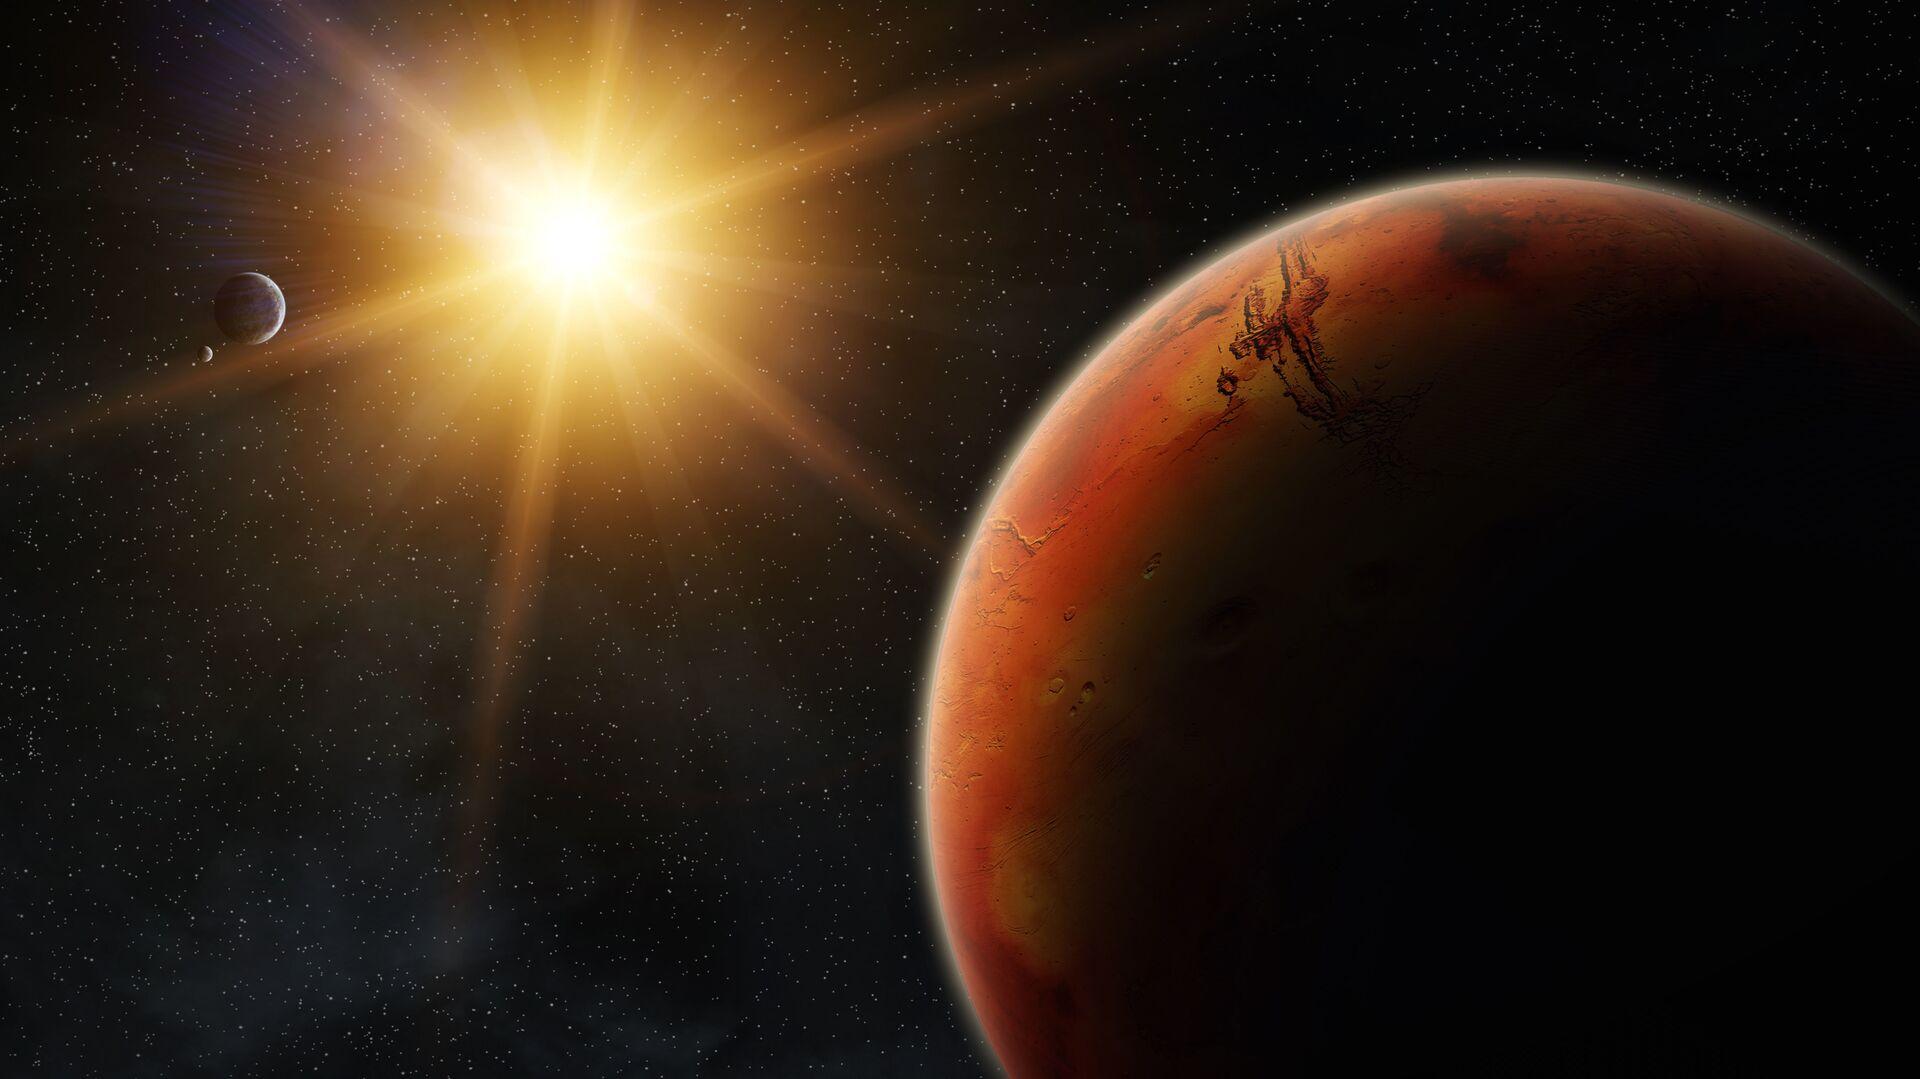 Марс во время восхода солнца - Sputnik Česká republika, 1920, 17.02.2021